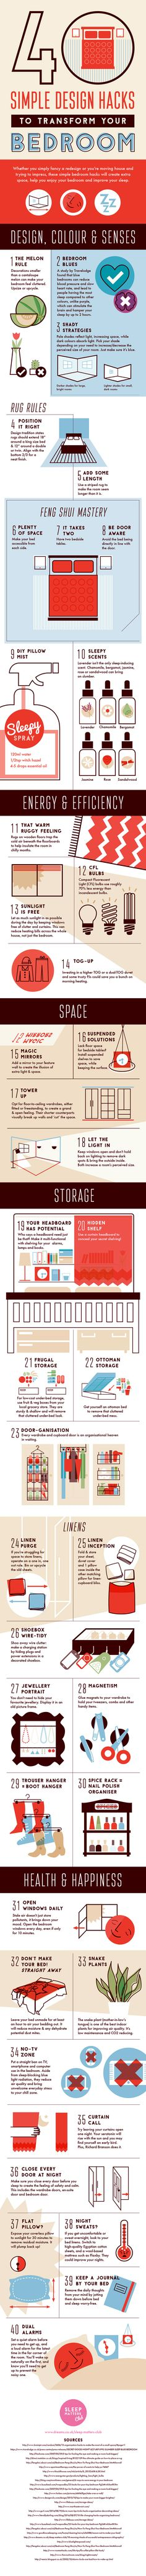 40 Simple Bedroom Design Ideas To Improve Your Life #Infographic #InteriorDesign #LifeStyle